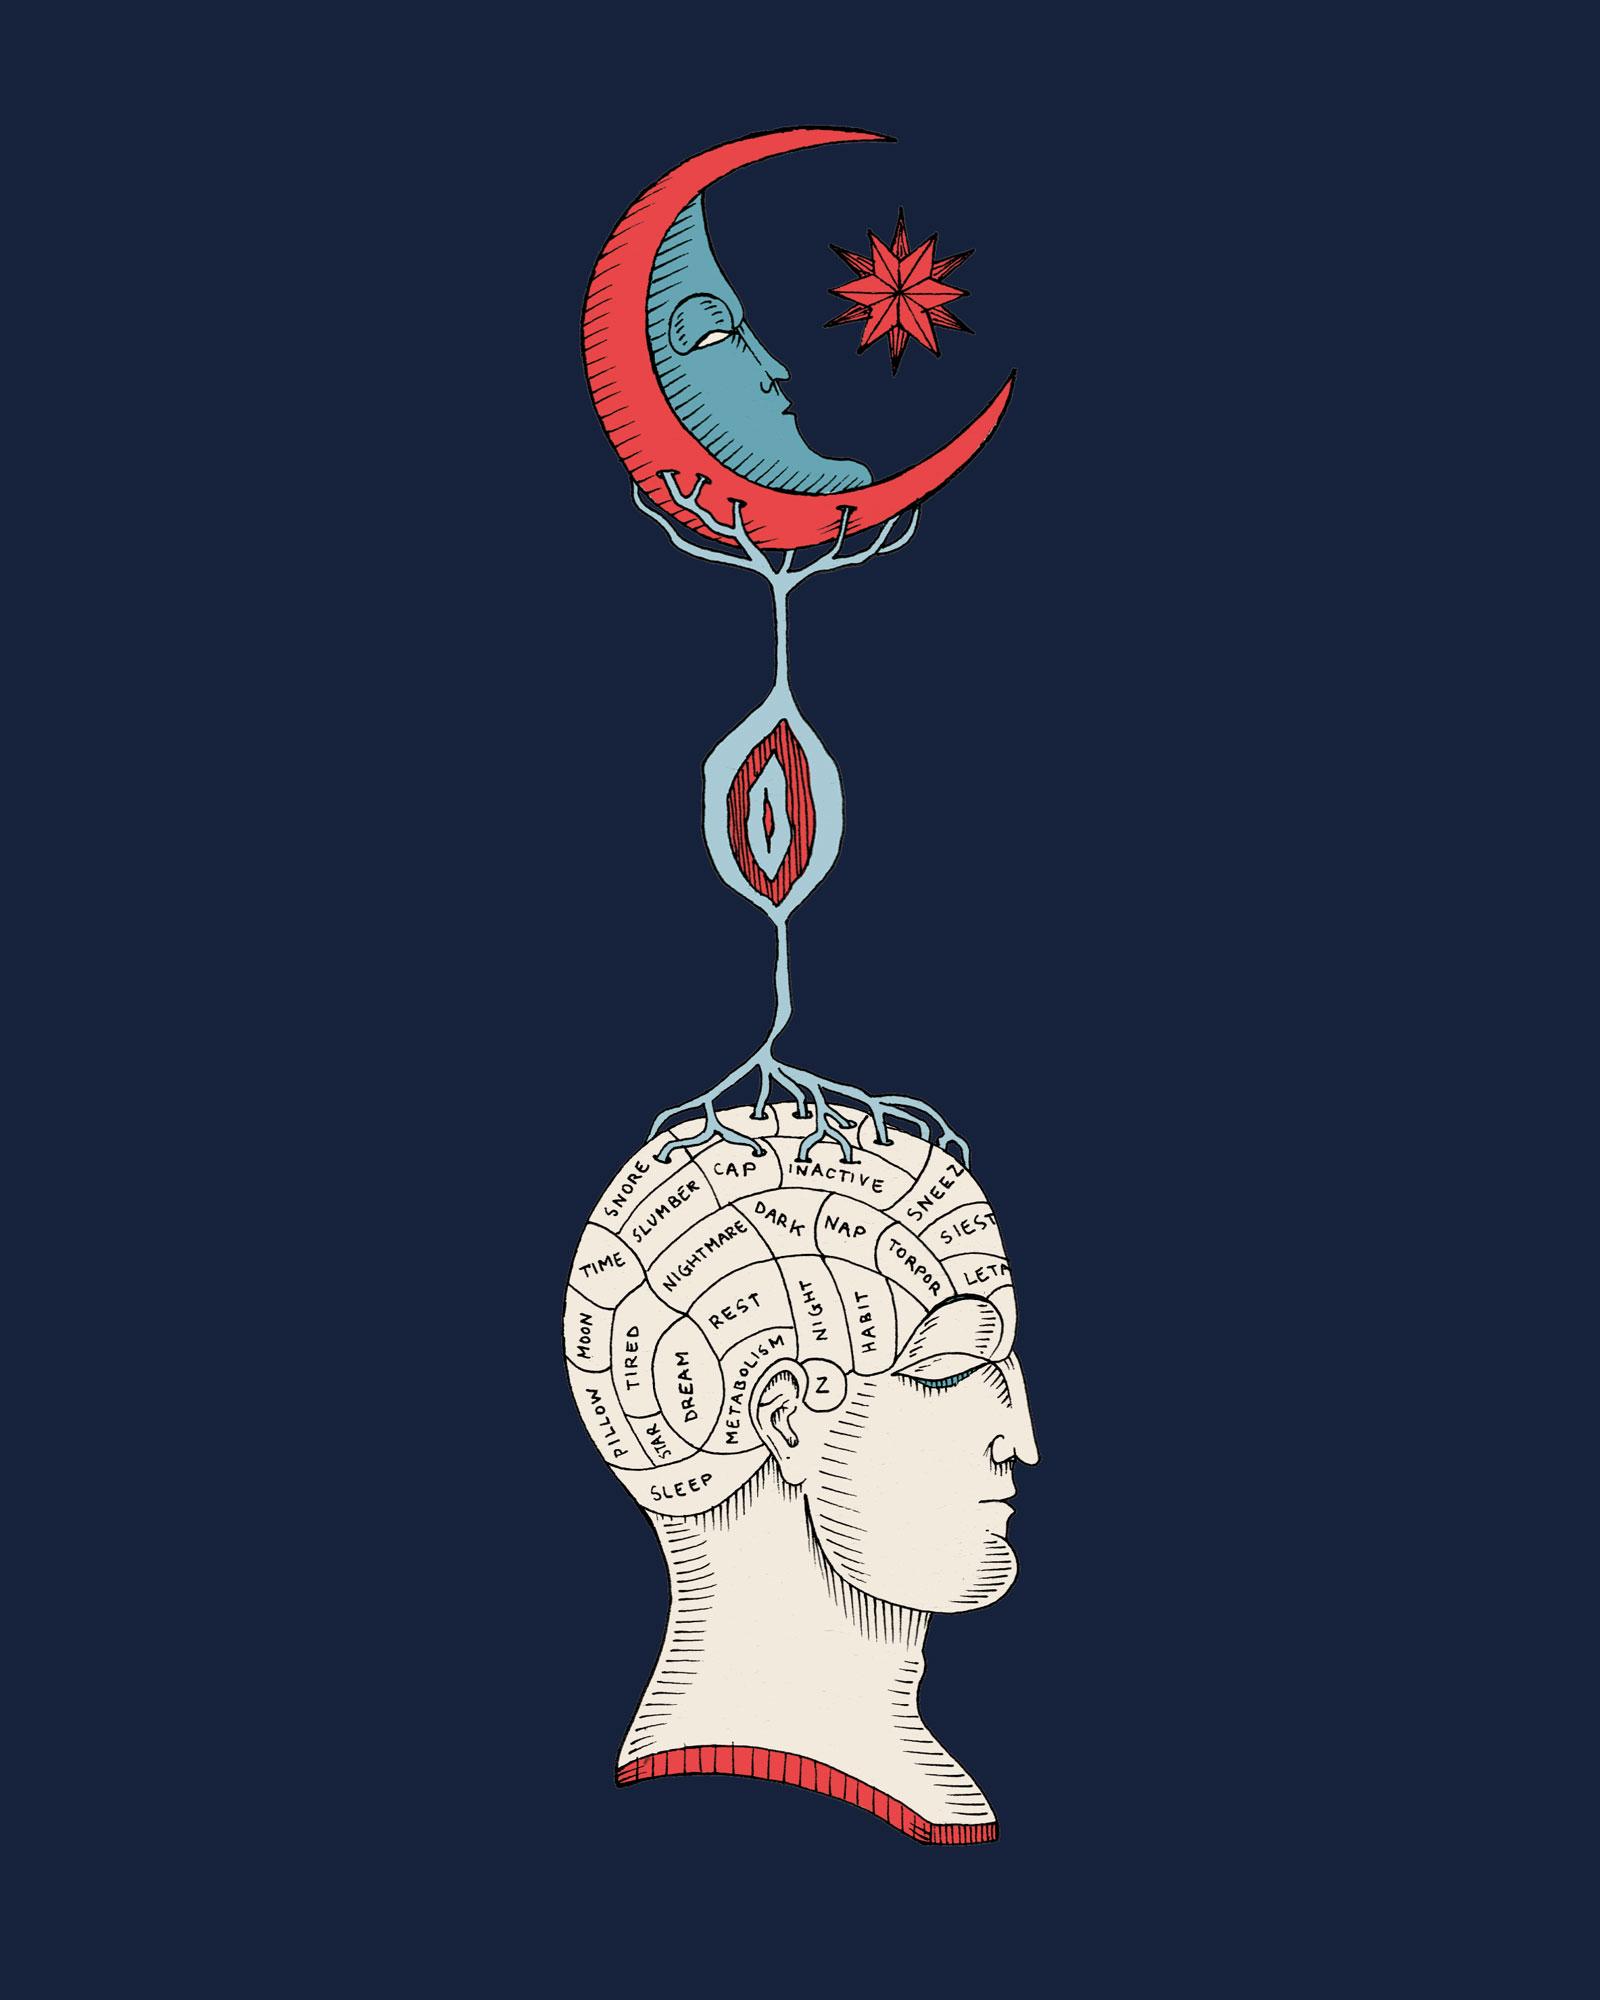 Illustration by Elisa Seitzinger